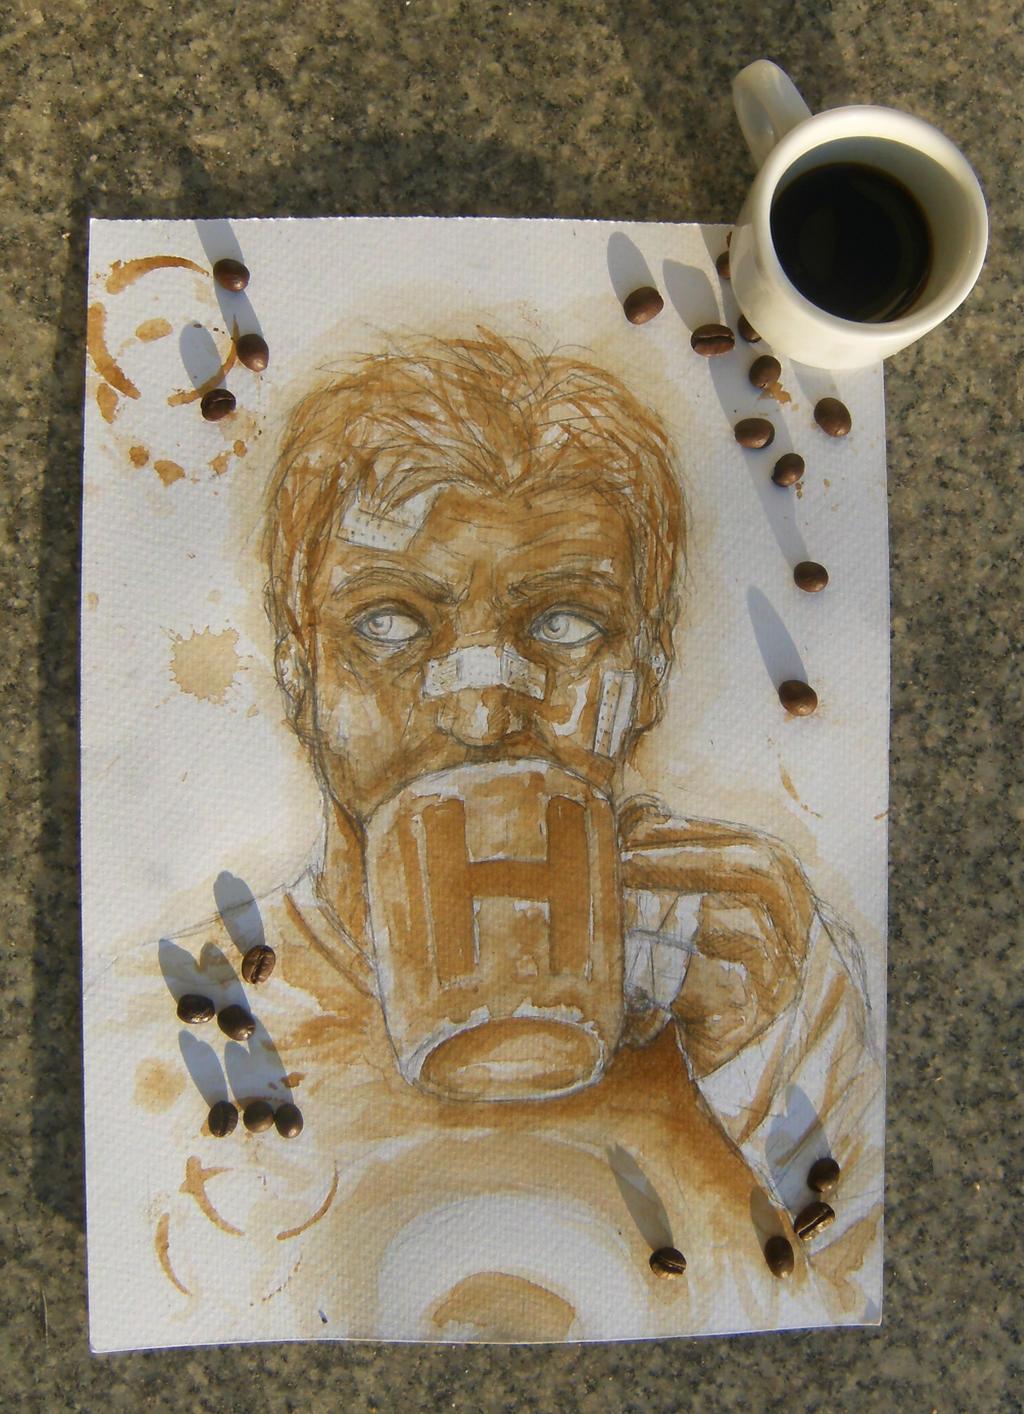 Hawkeye and coffee by minihumanoid